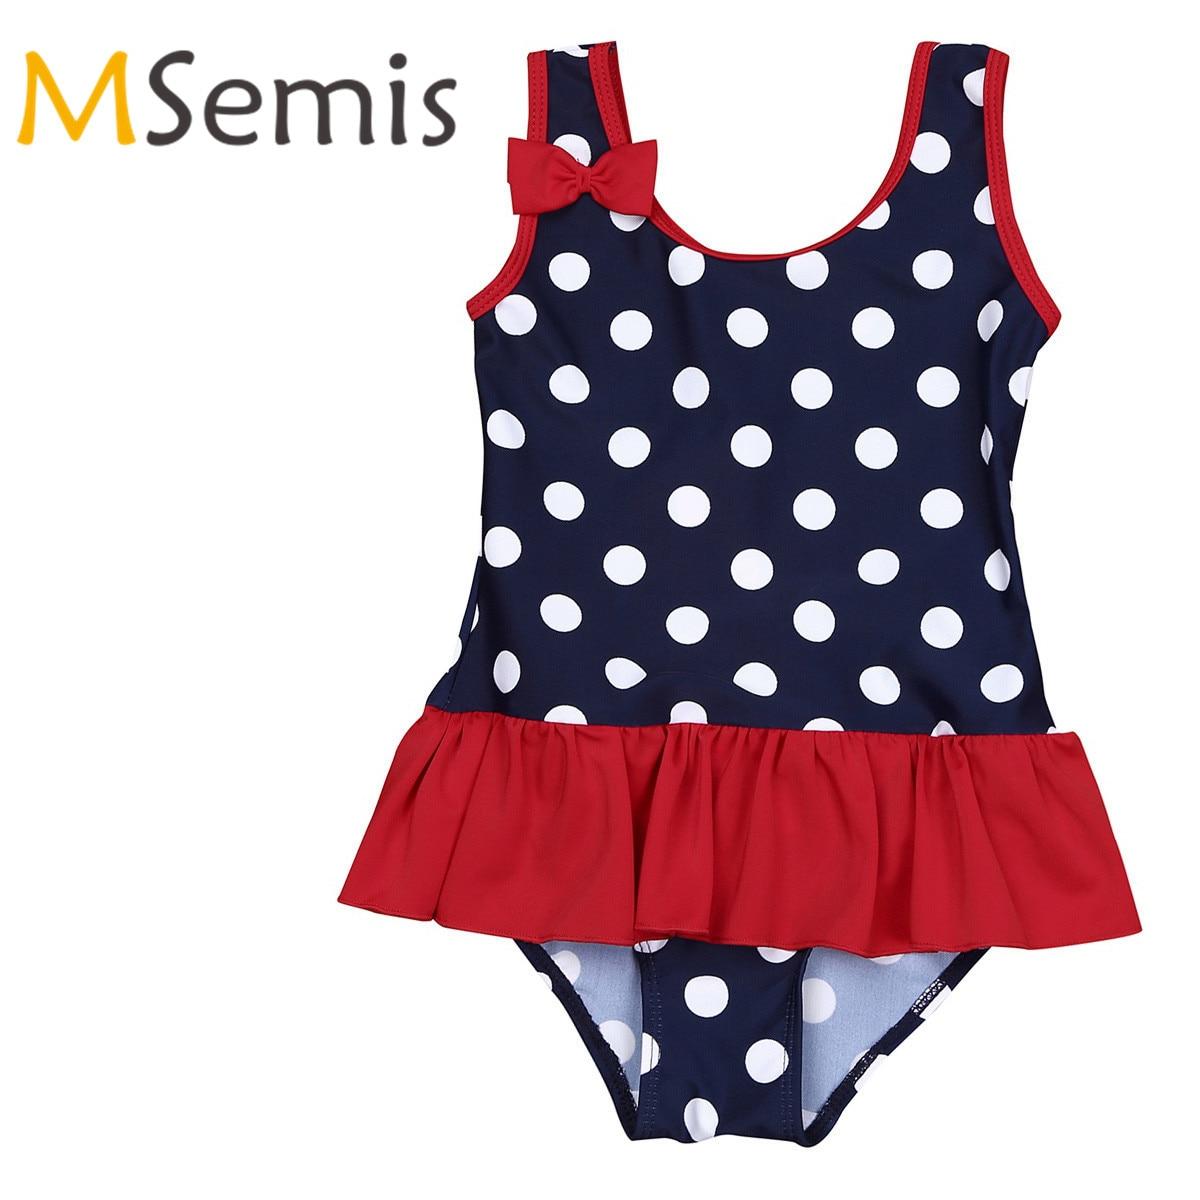 Kids Girls Swimsuit Gymnastics Leotard Swimming Suit Infant Bady One Piece Swimwear Polka Dots Ruffles Children's Swimming Suit